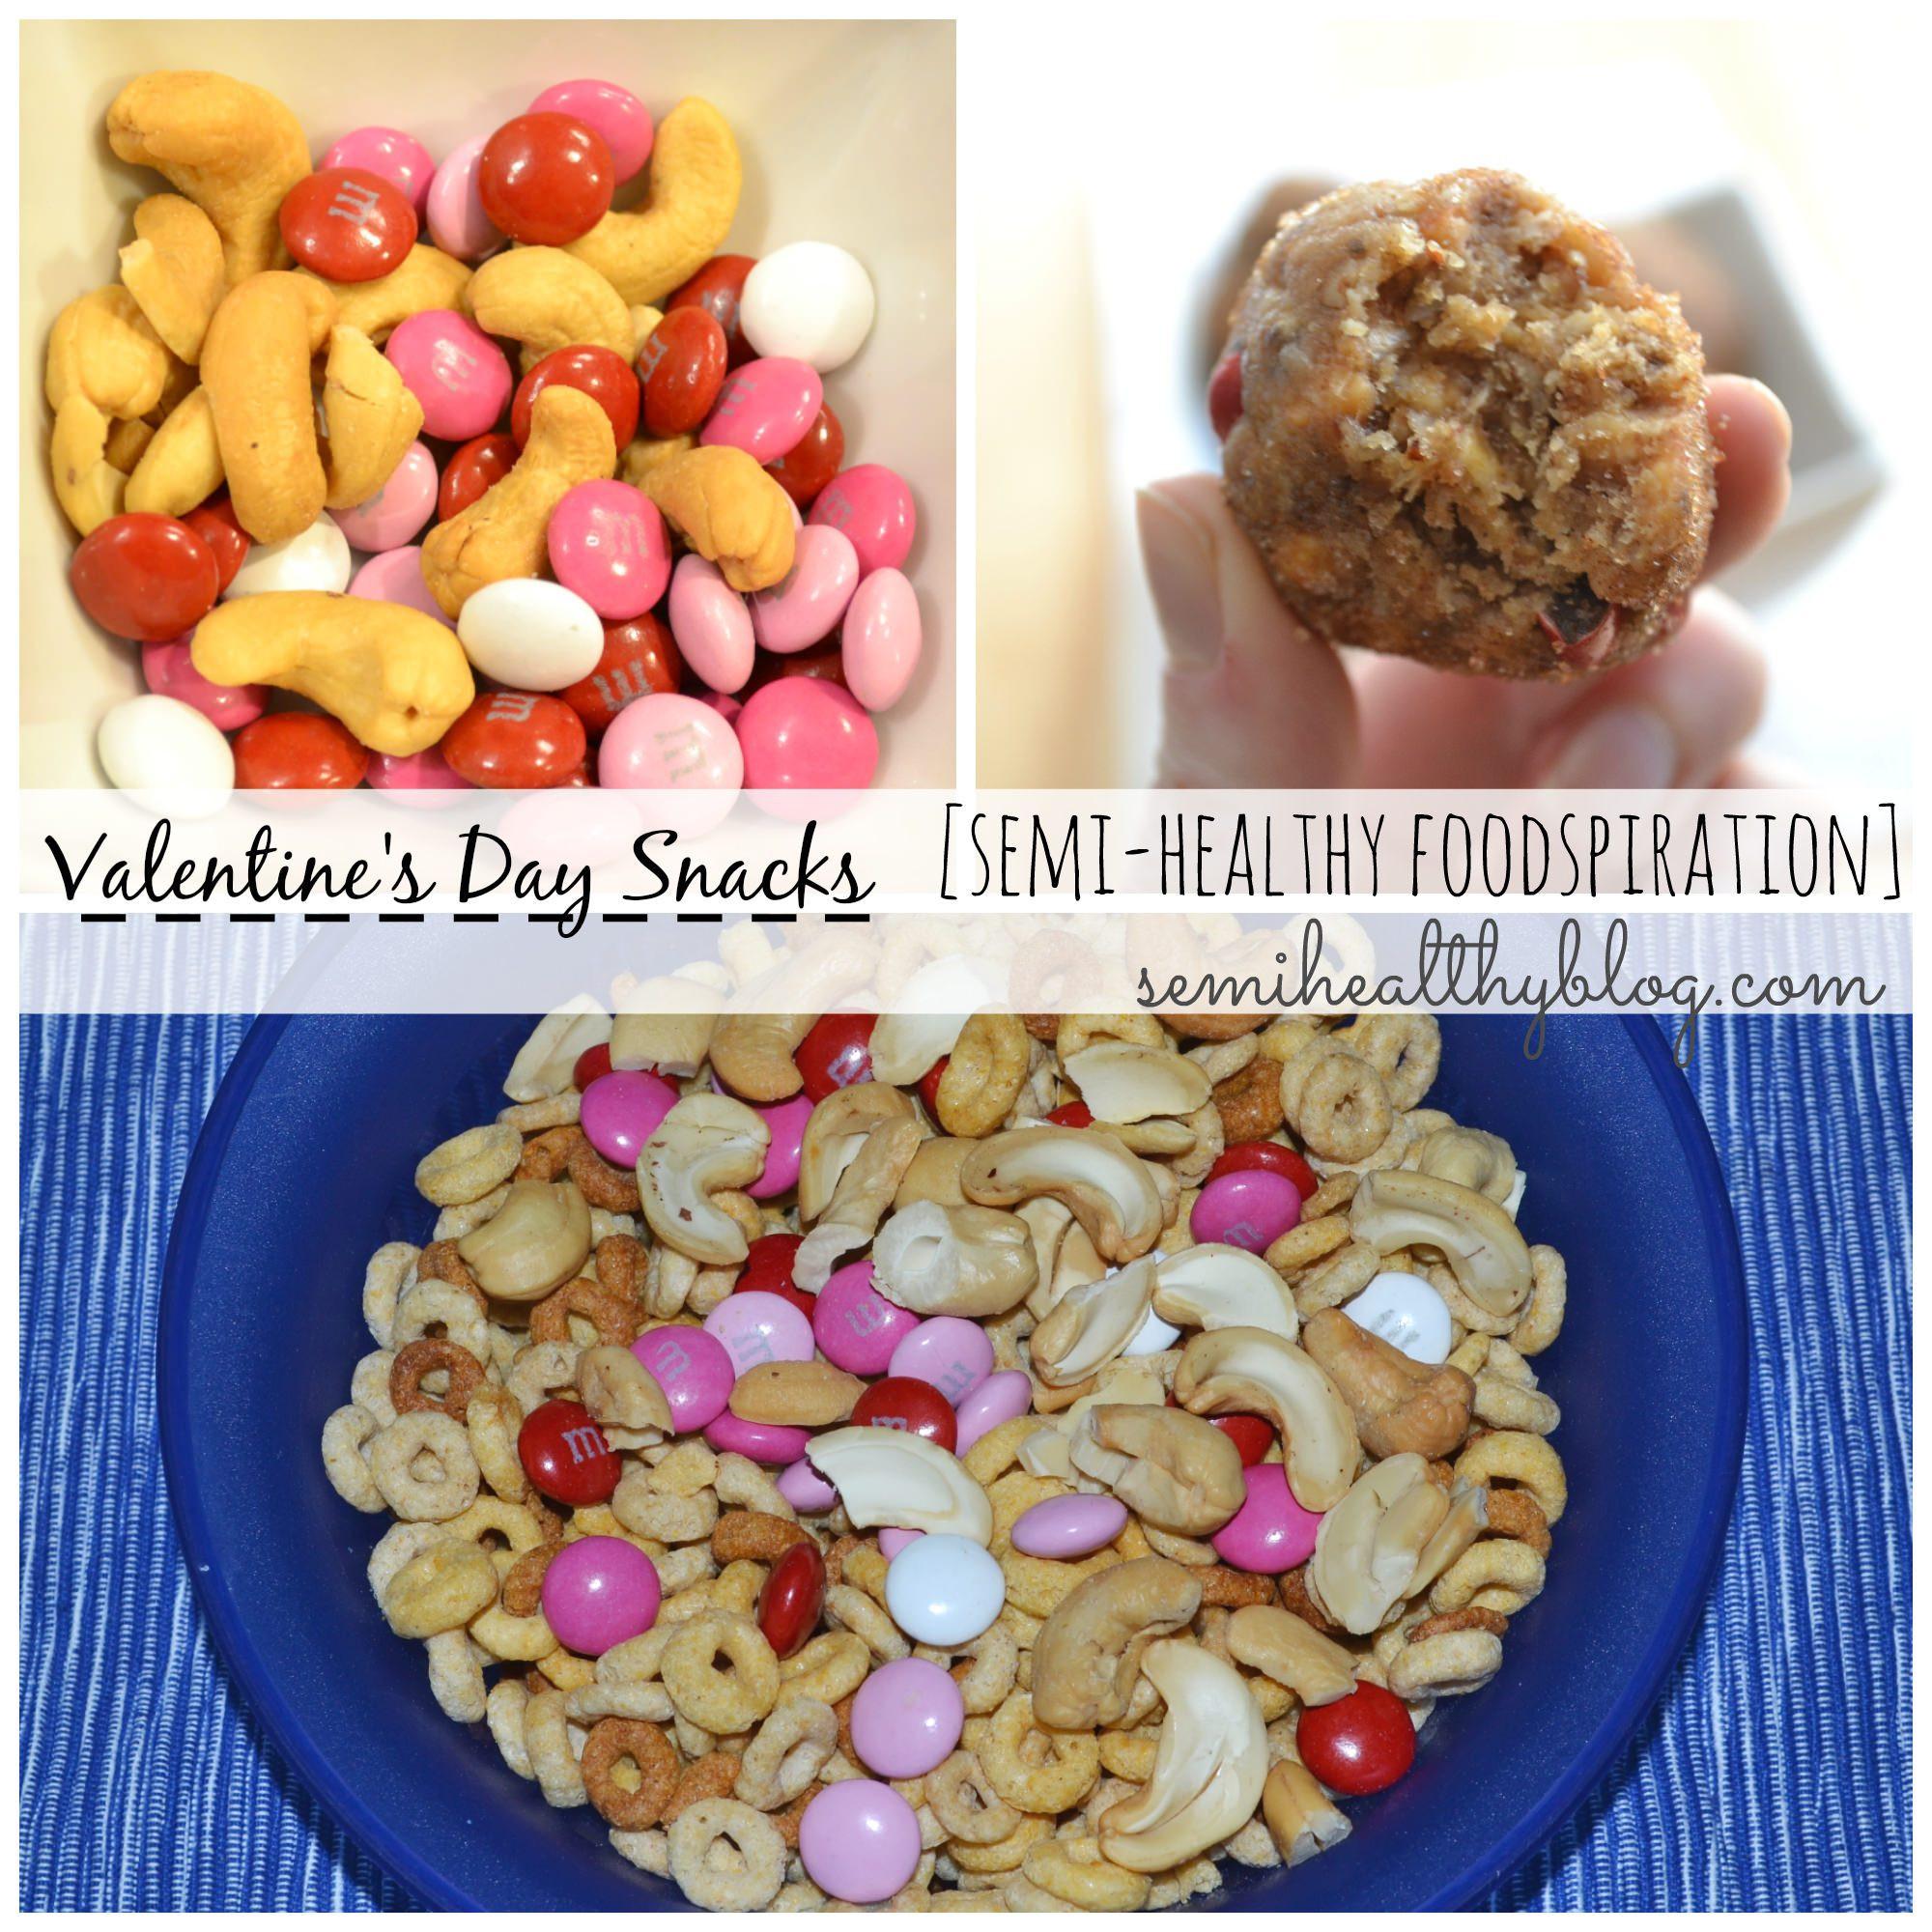 Semi Healthy Snacks  Semi Healthy Foodspiration 2